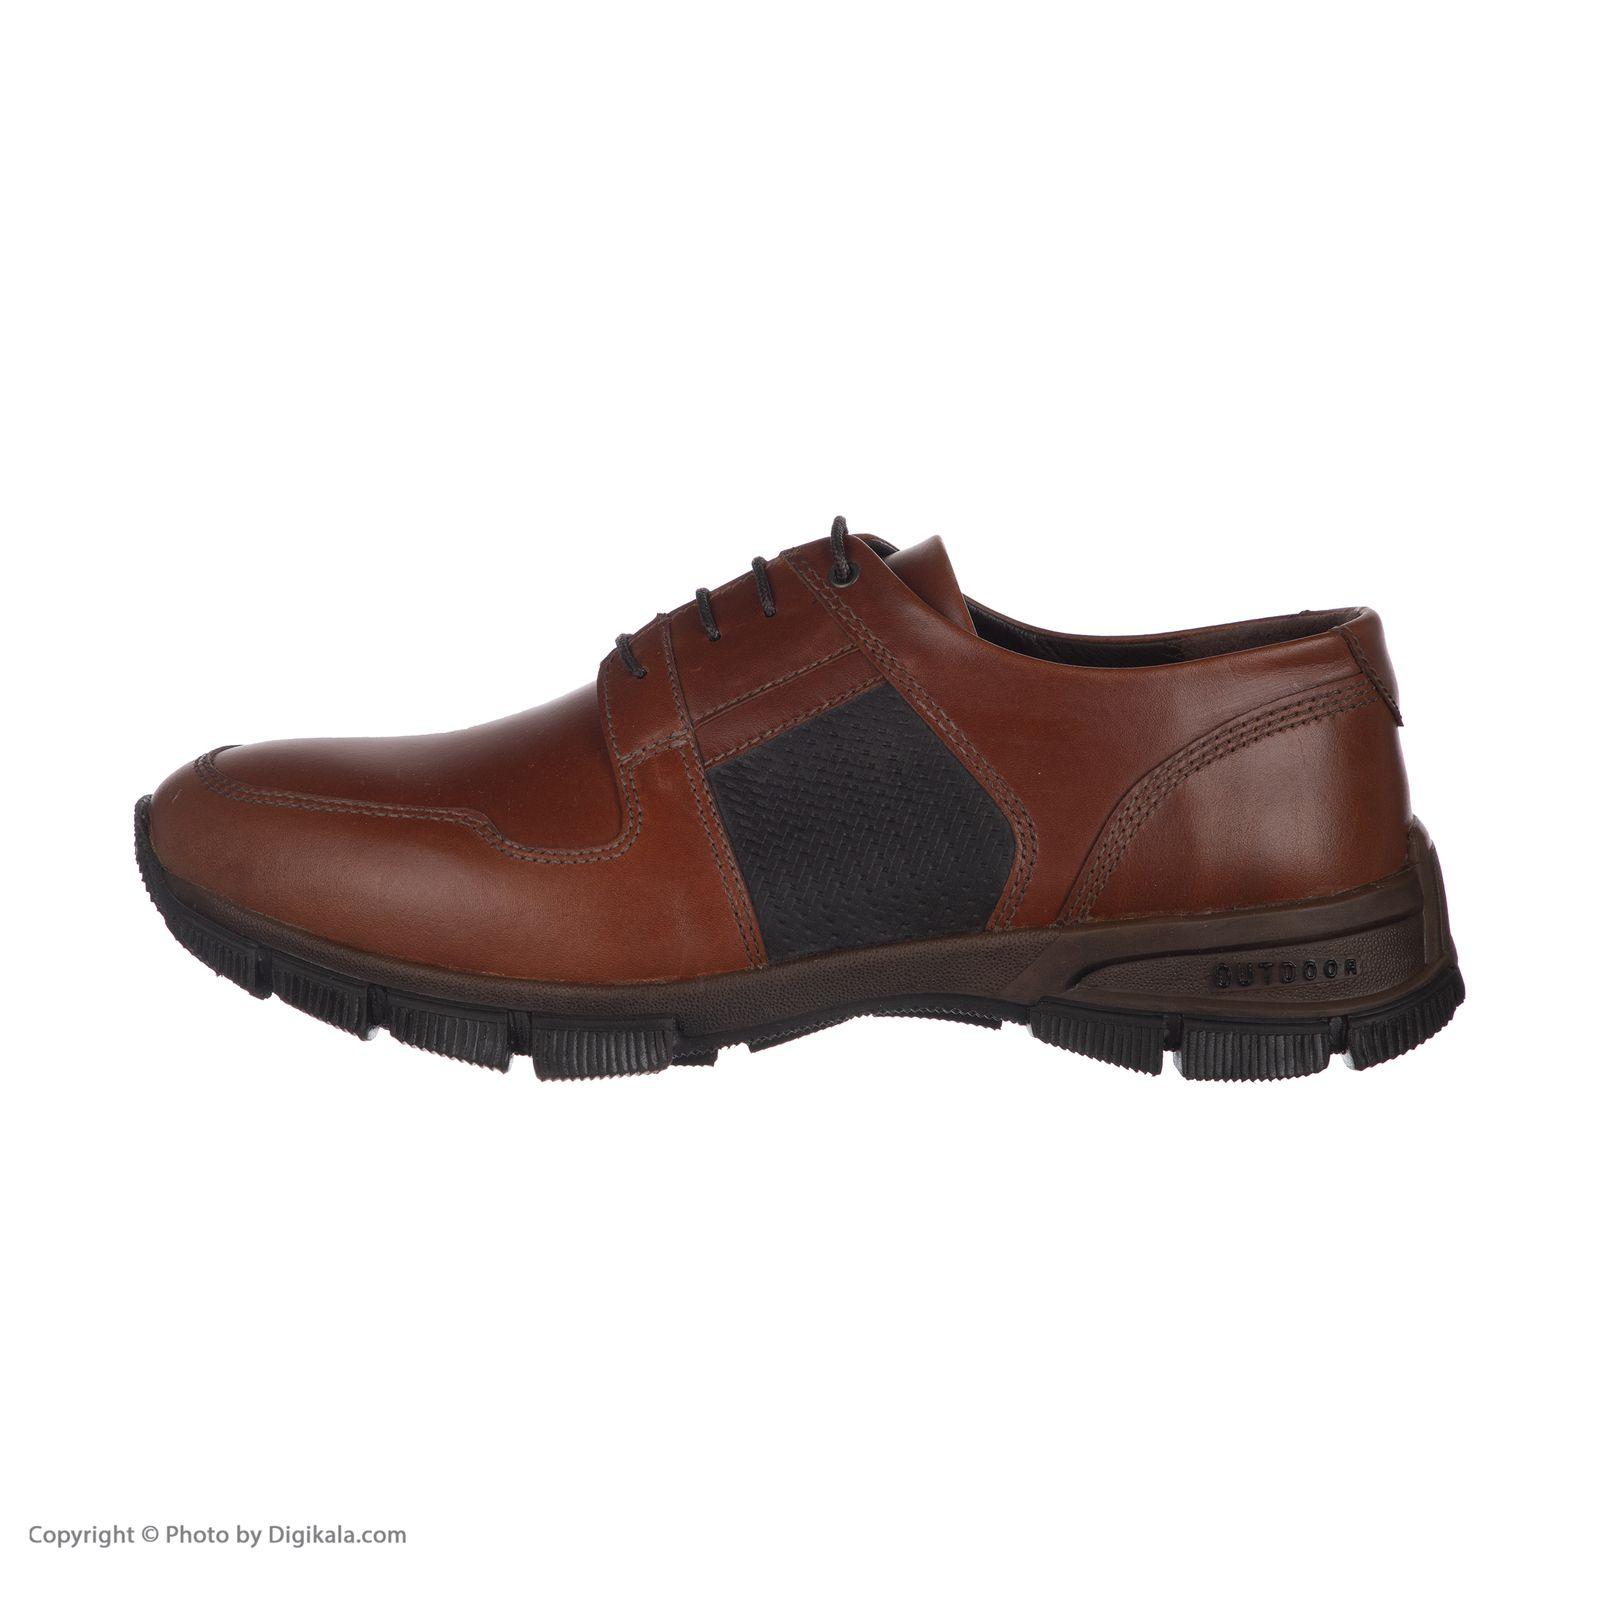 کفش روزمره مردانه دانادل مدل 8604B503136 -  - 1